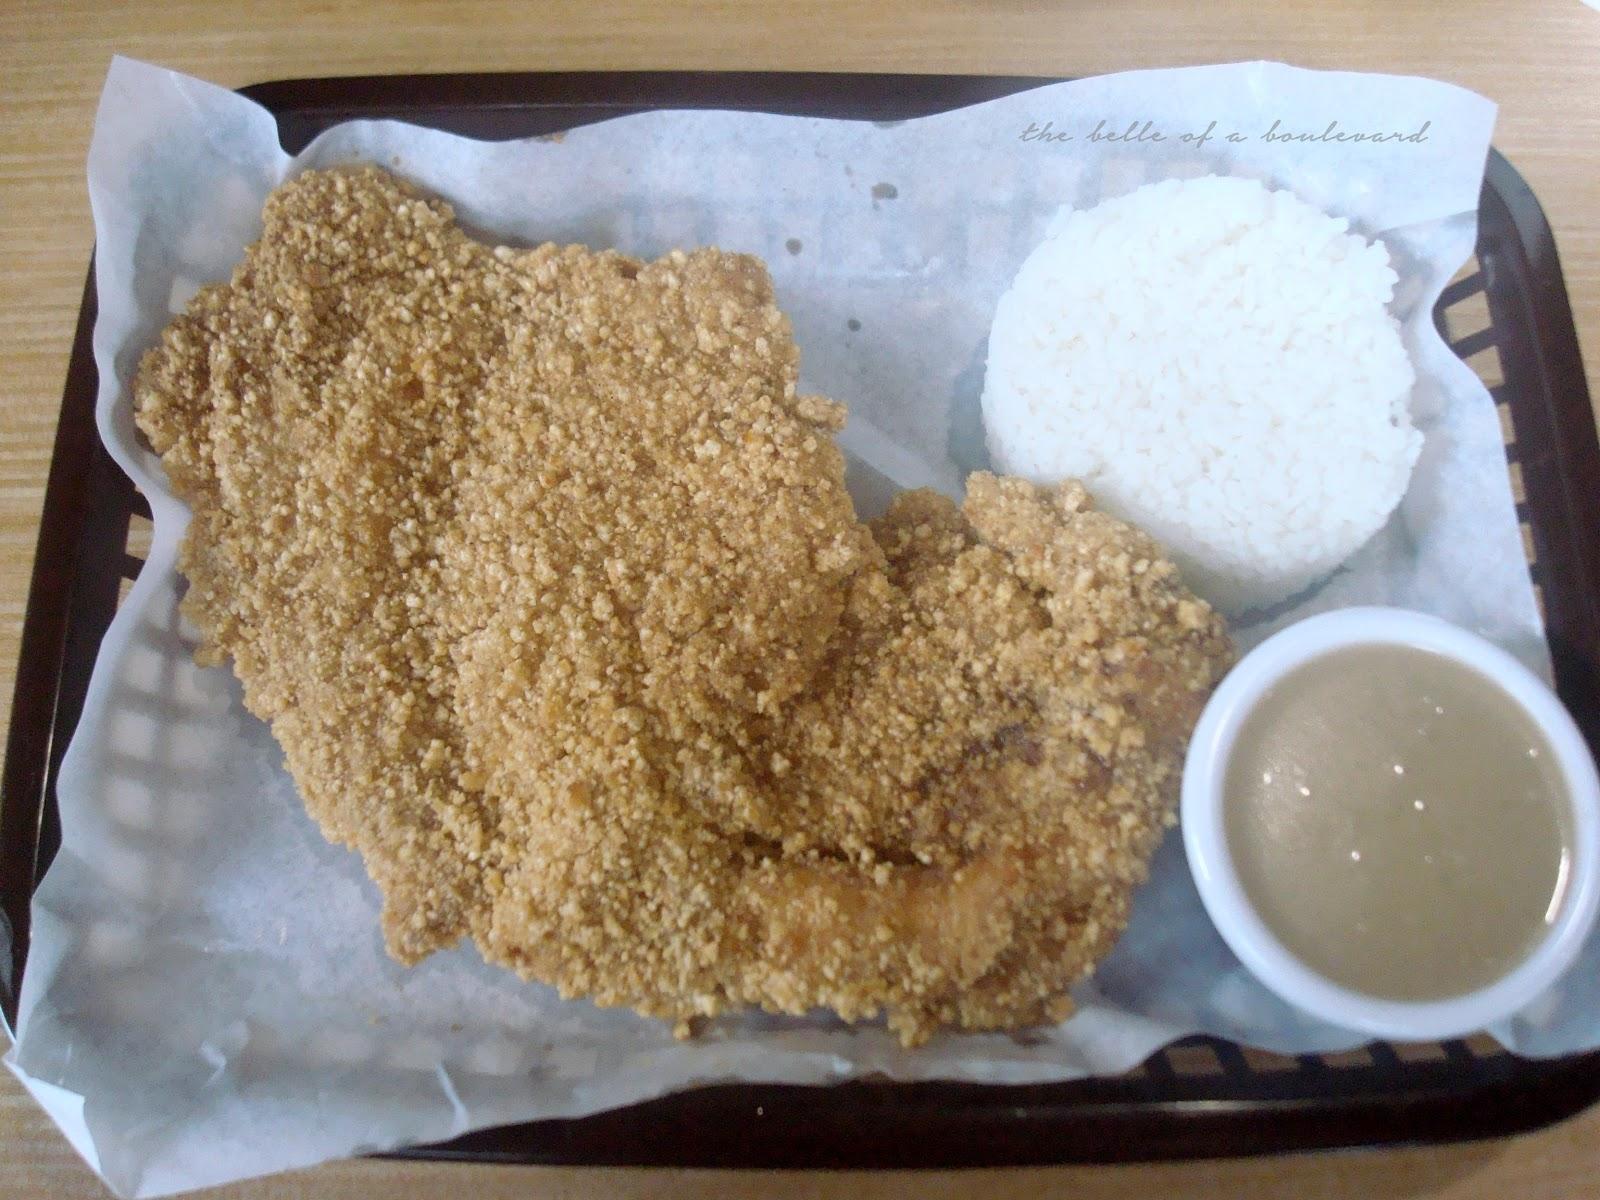 Hot Star Katipunan - Original Chicken